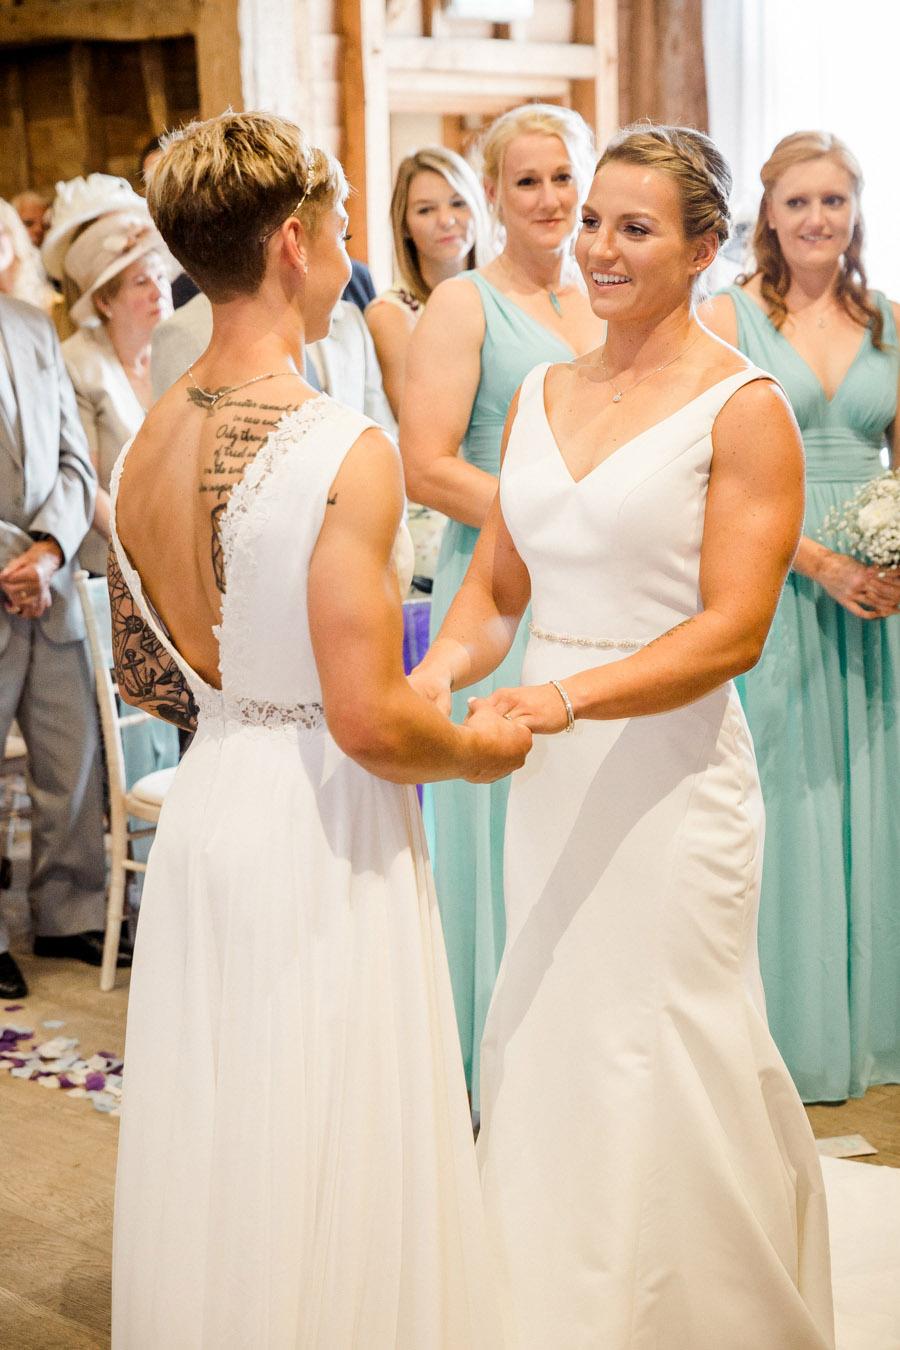 Tewin Bury farm wedding blog, photo credit Absolute Photo UK (15)